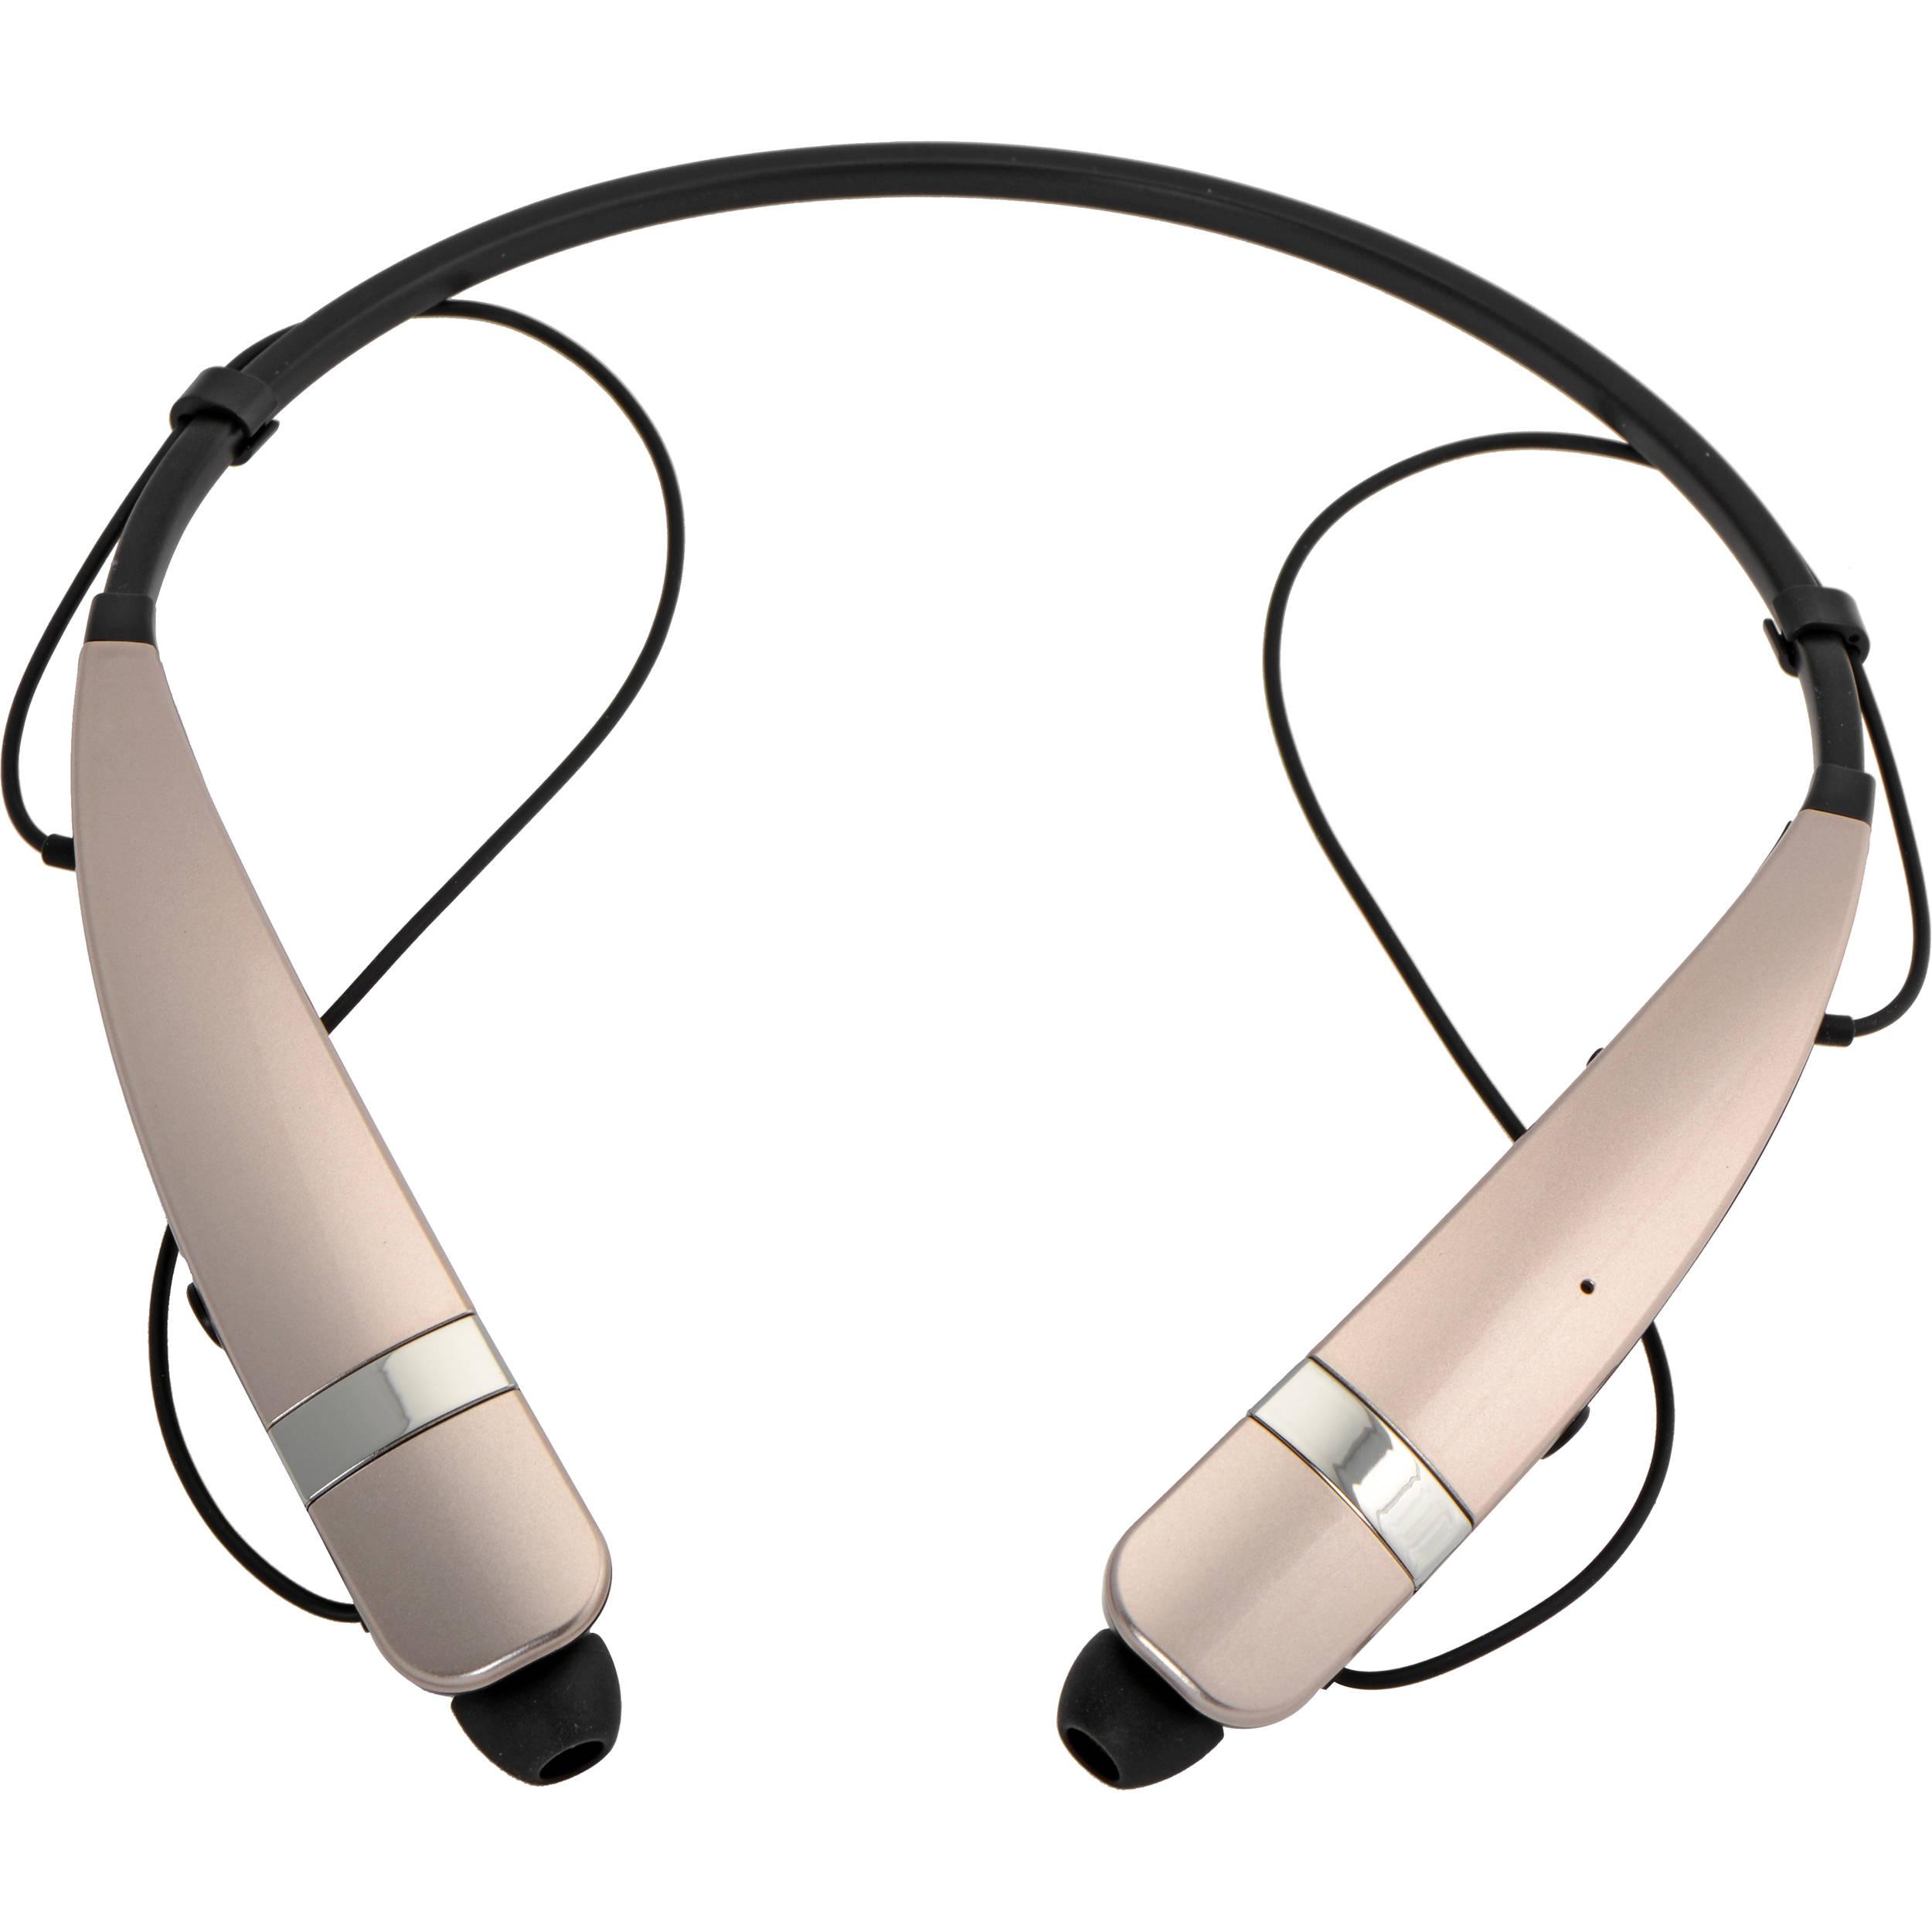 LG HBS-760 TONE PRO Bluetooth Wireless Stereo Headset (Gold